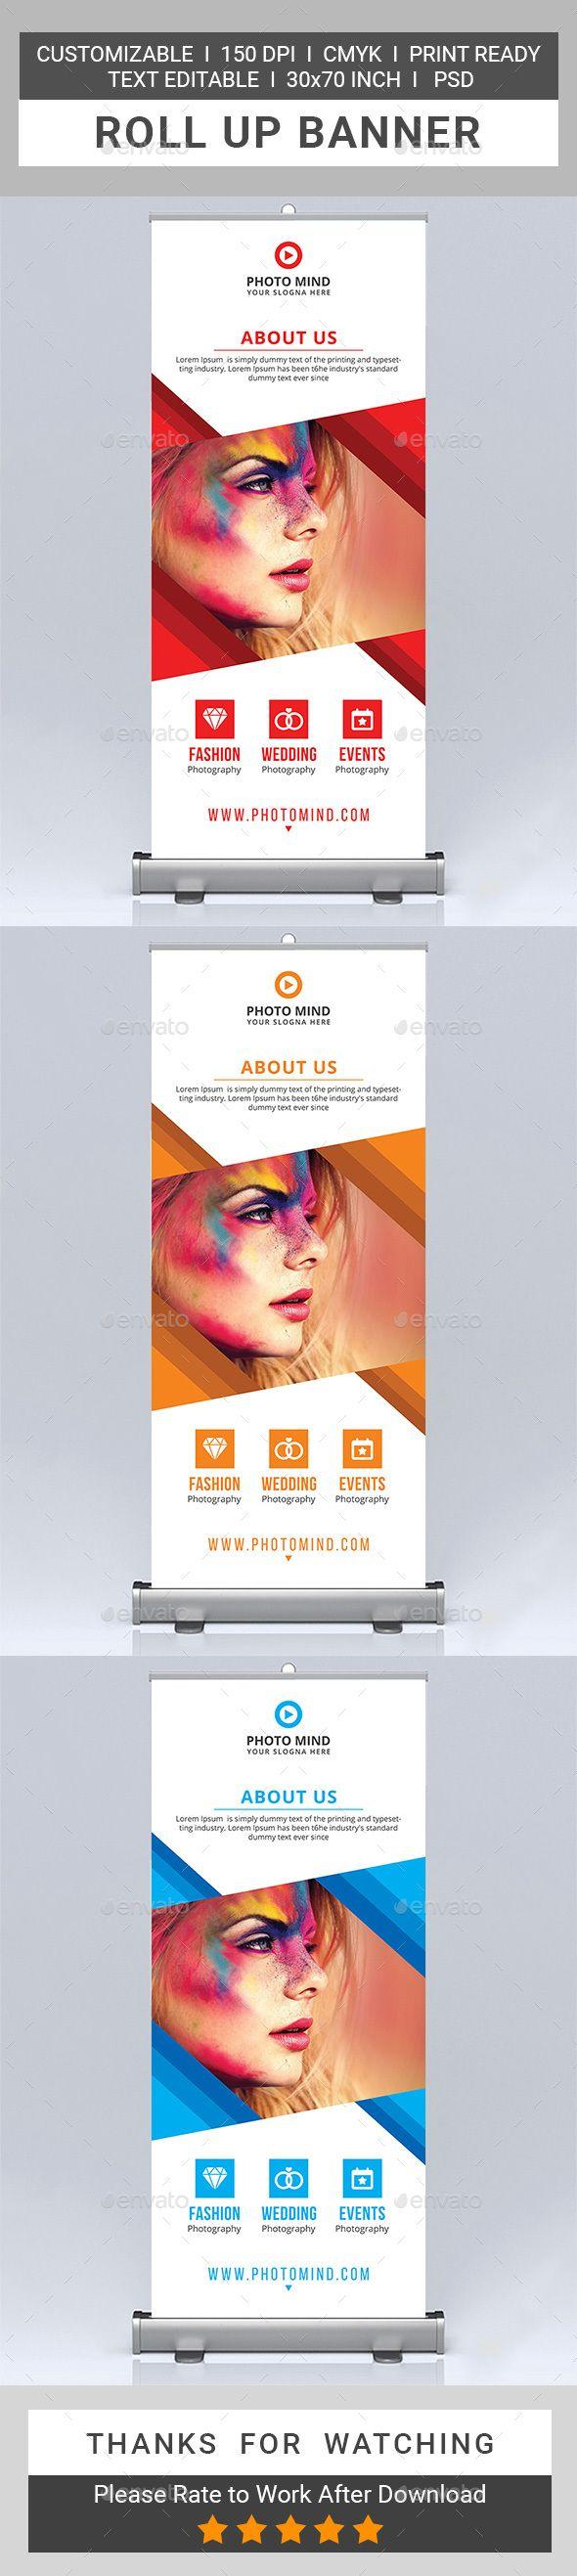 Photography Roll Up Banner Design Template - Signage Ads Banner Design Print Tem...